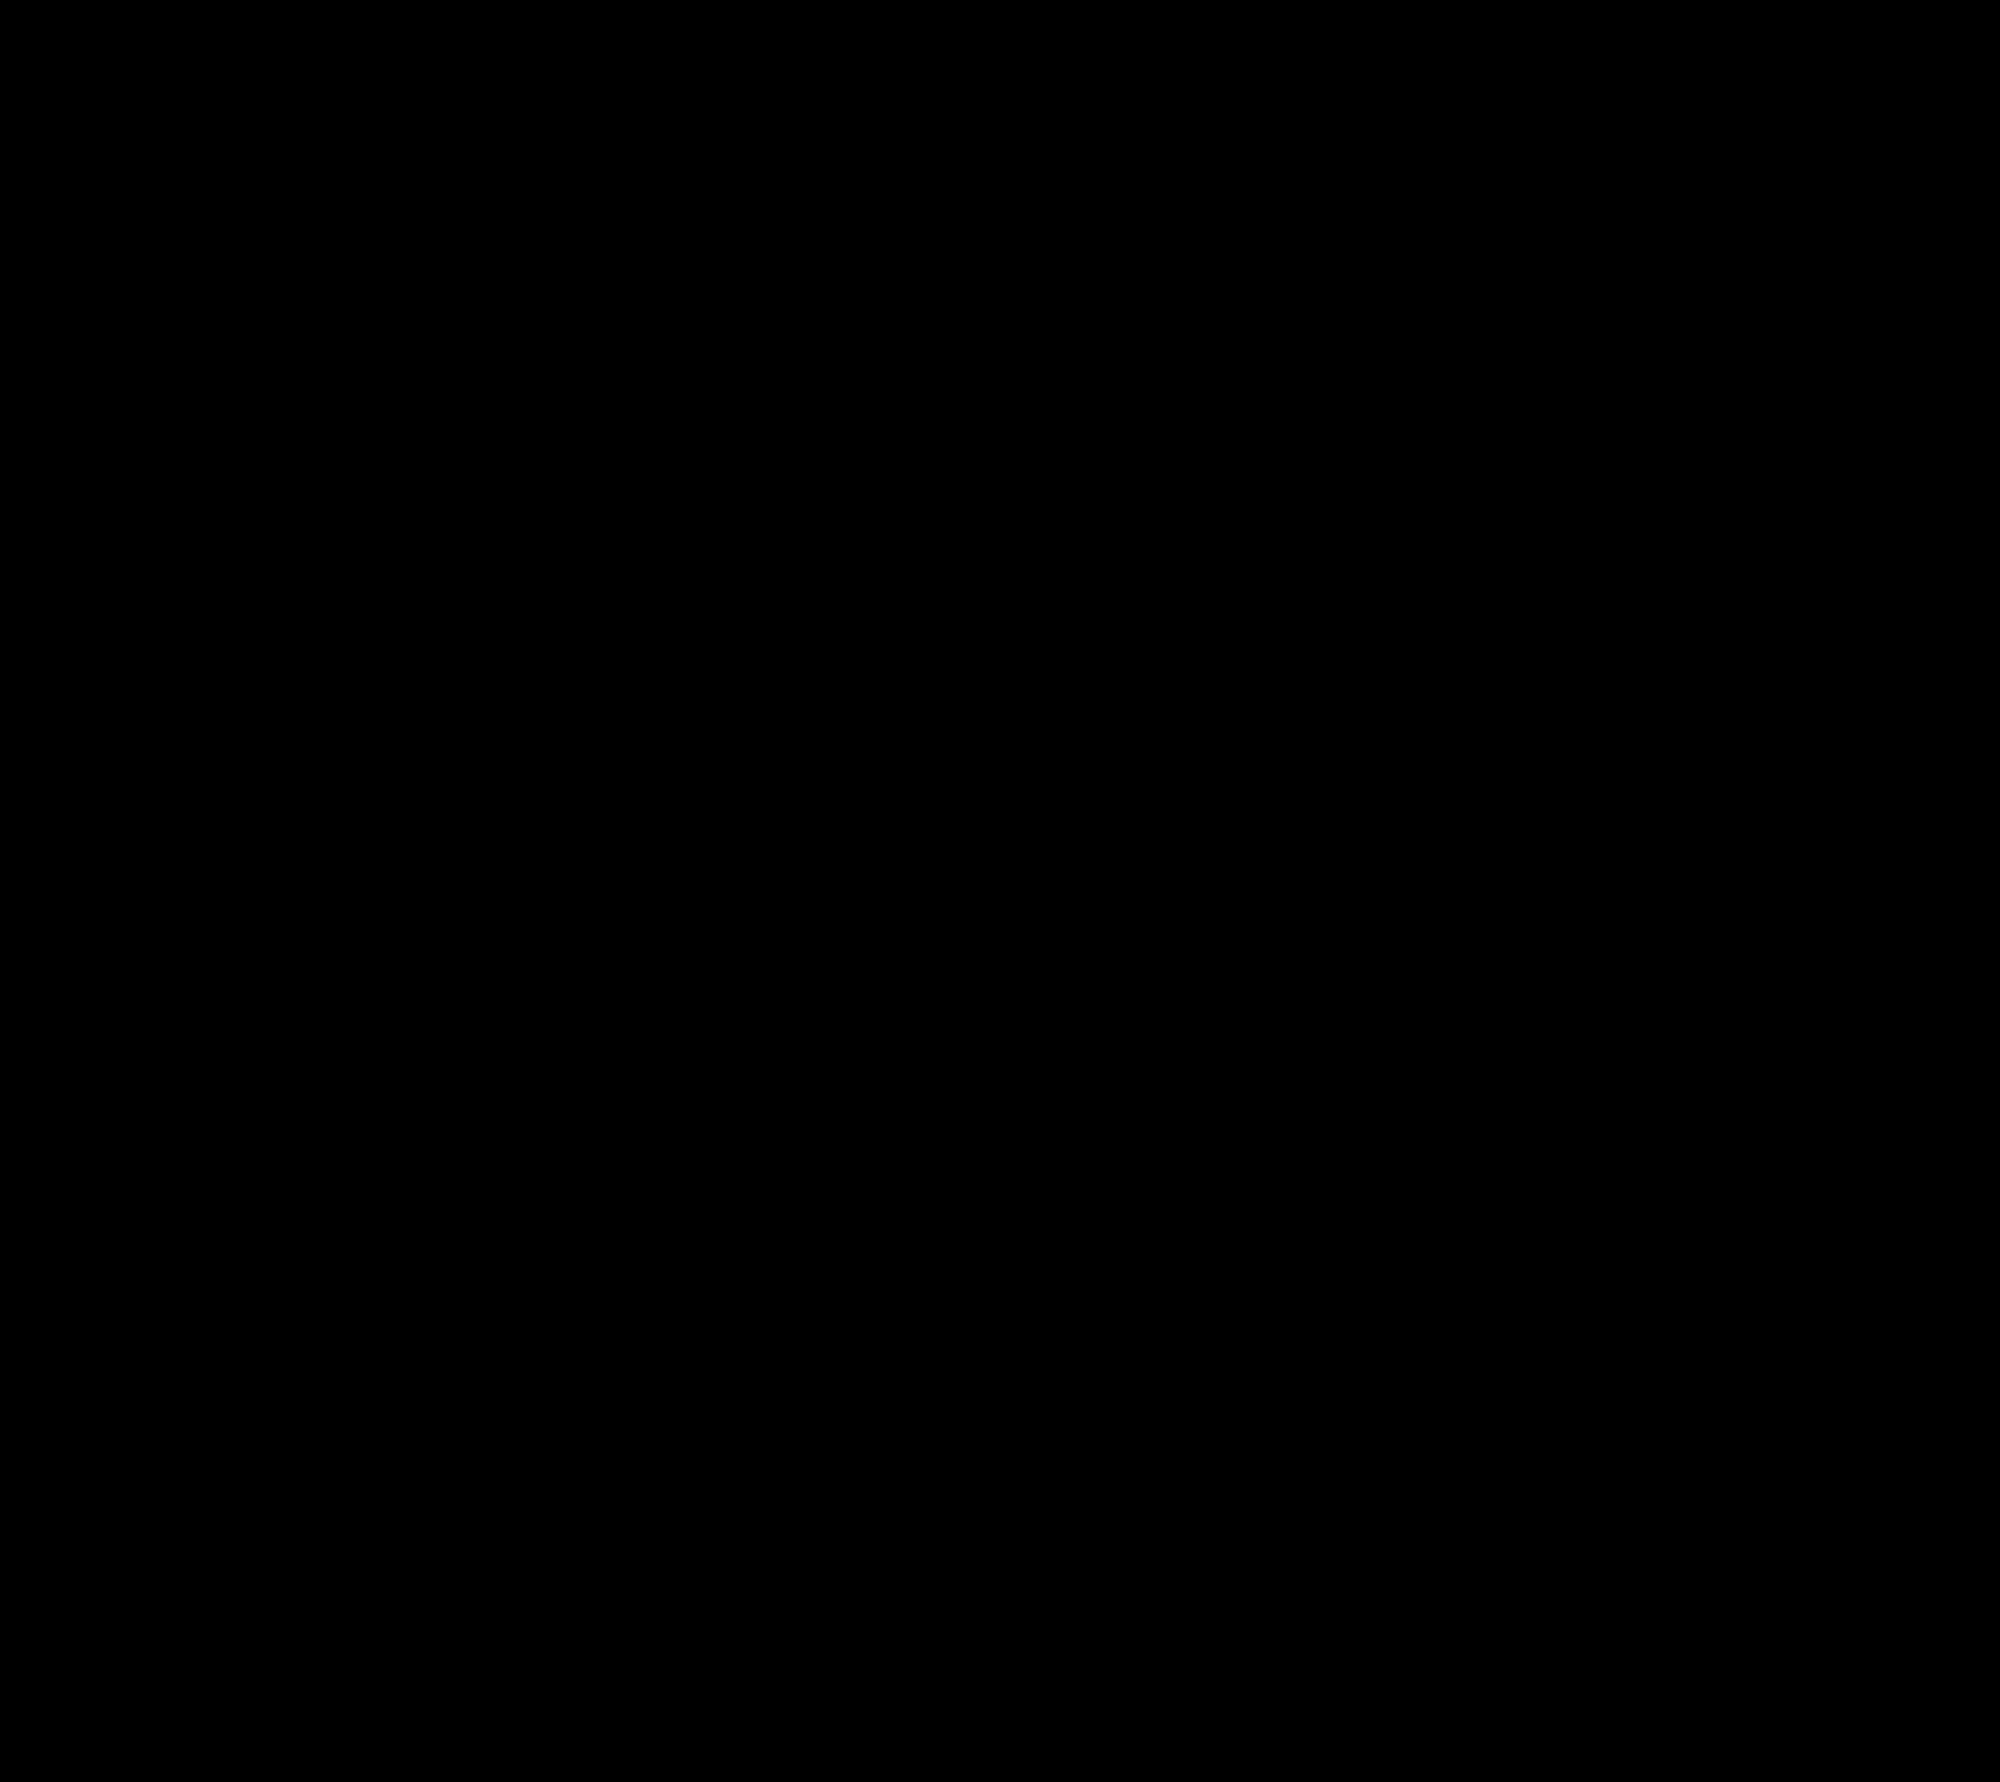 logo-black(5).png